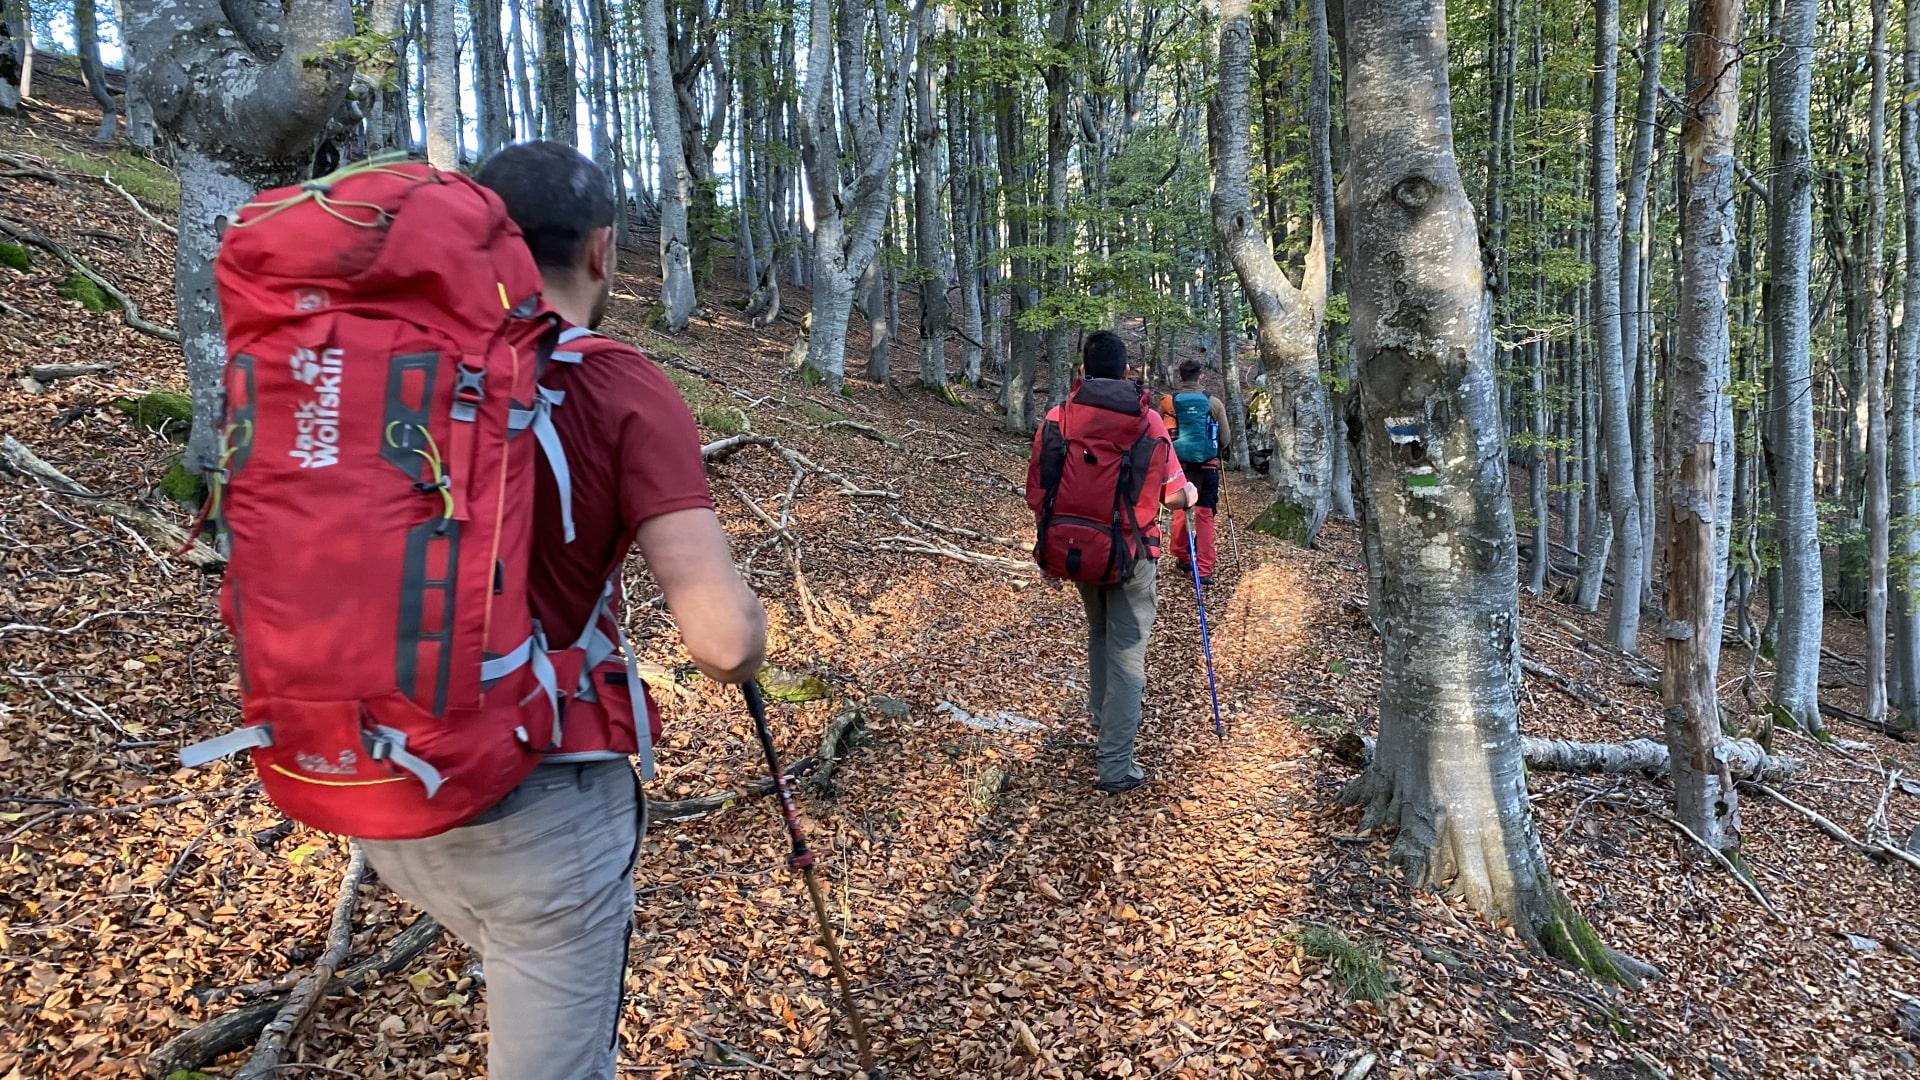 Hiking in Central Balkan National Park